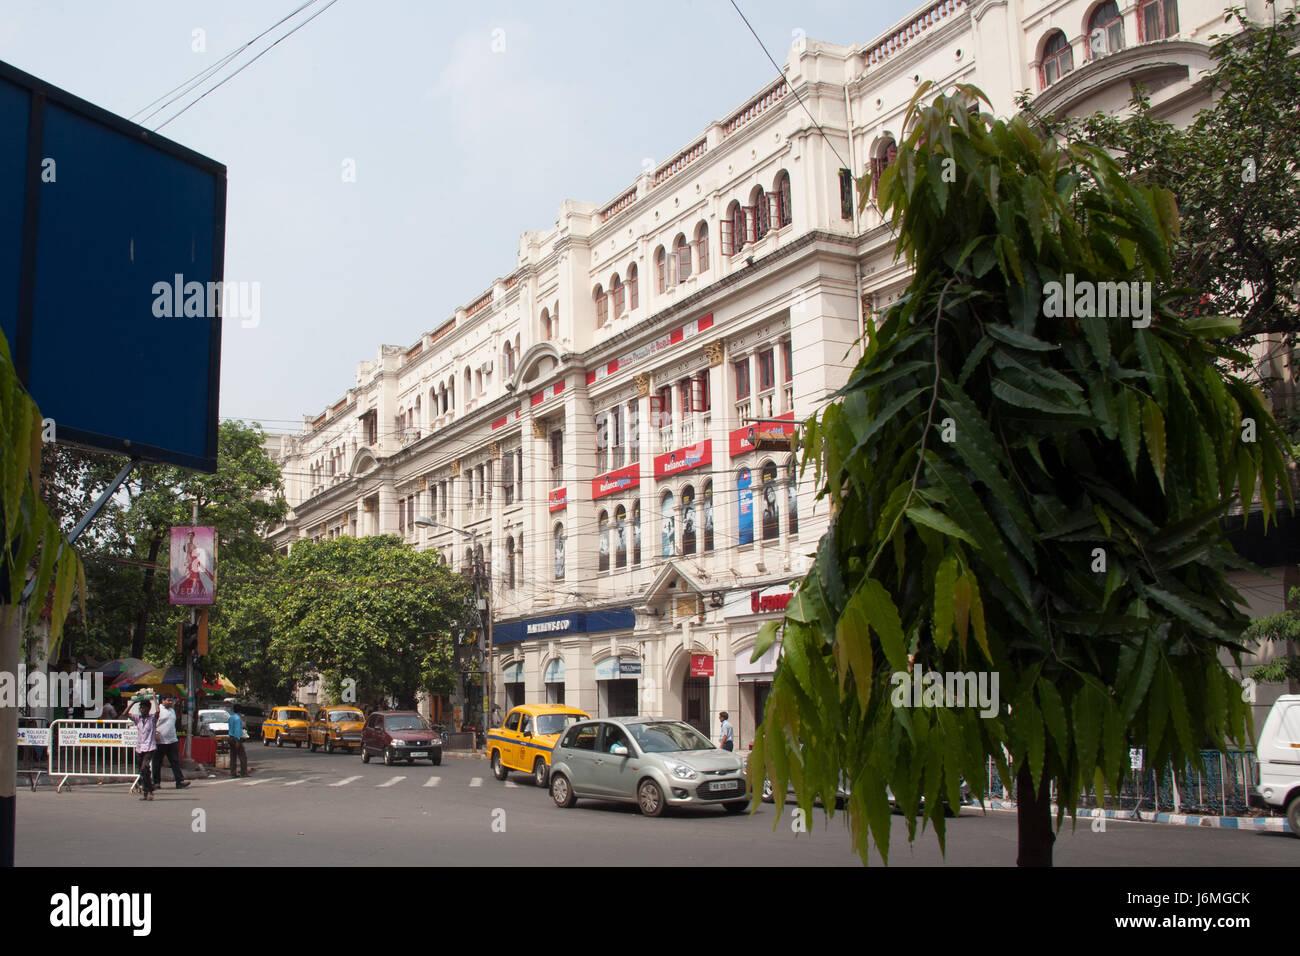 Park Street (officially Mother Teresa Sarani formerly Burial Ground Road a famous Kolkata  - Calcutta - thoroughfare - Stock Image